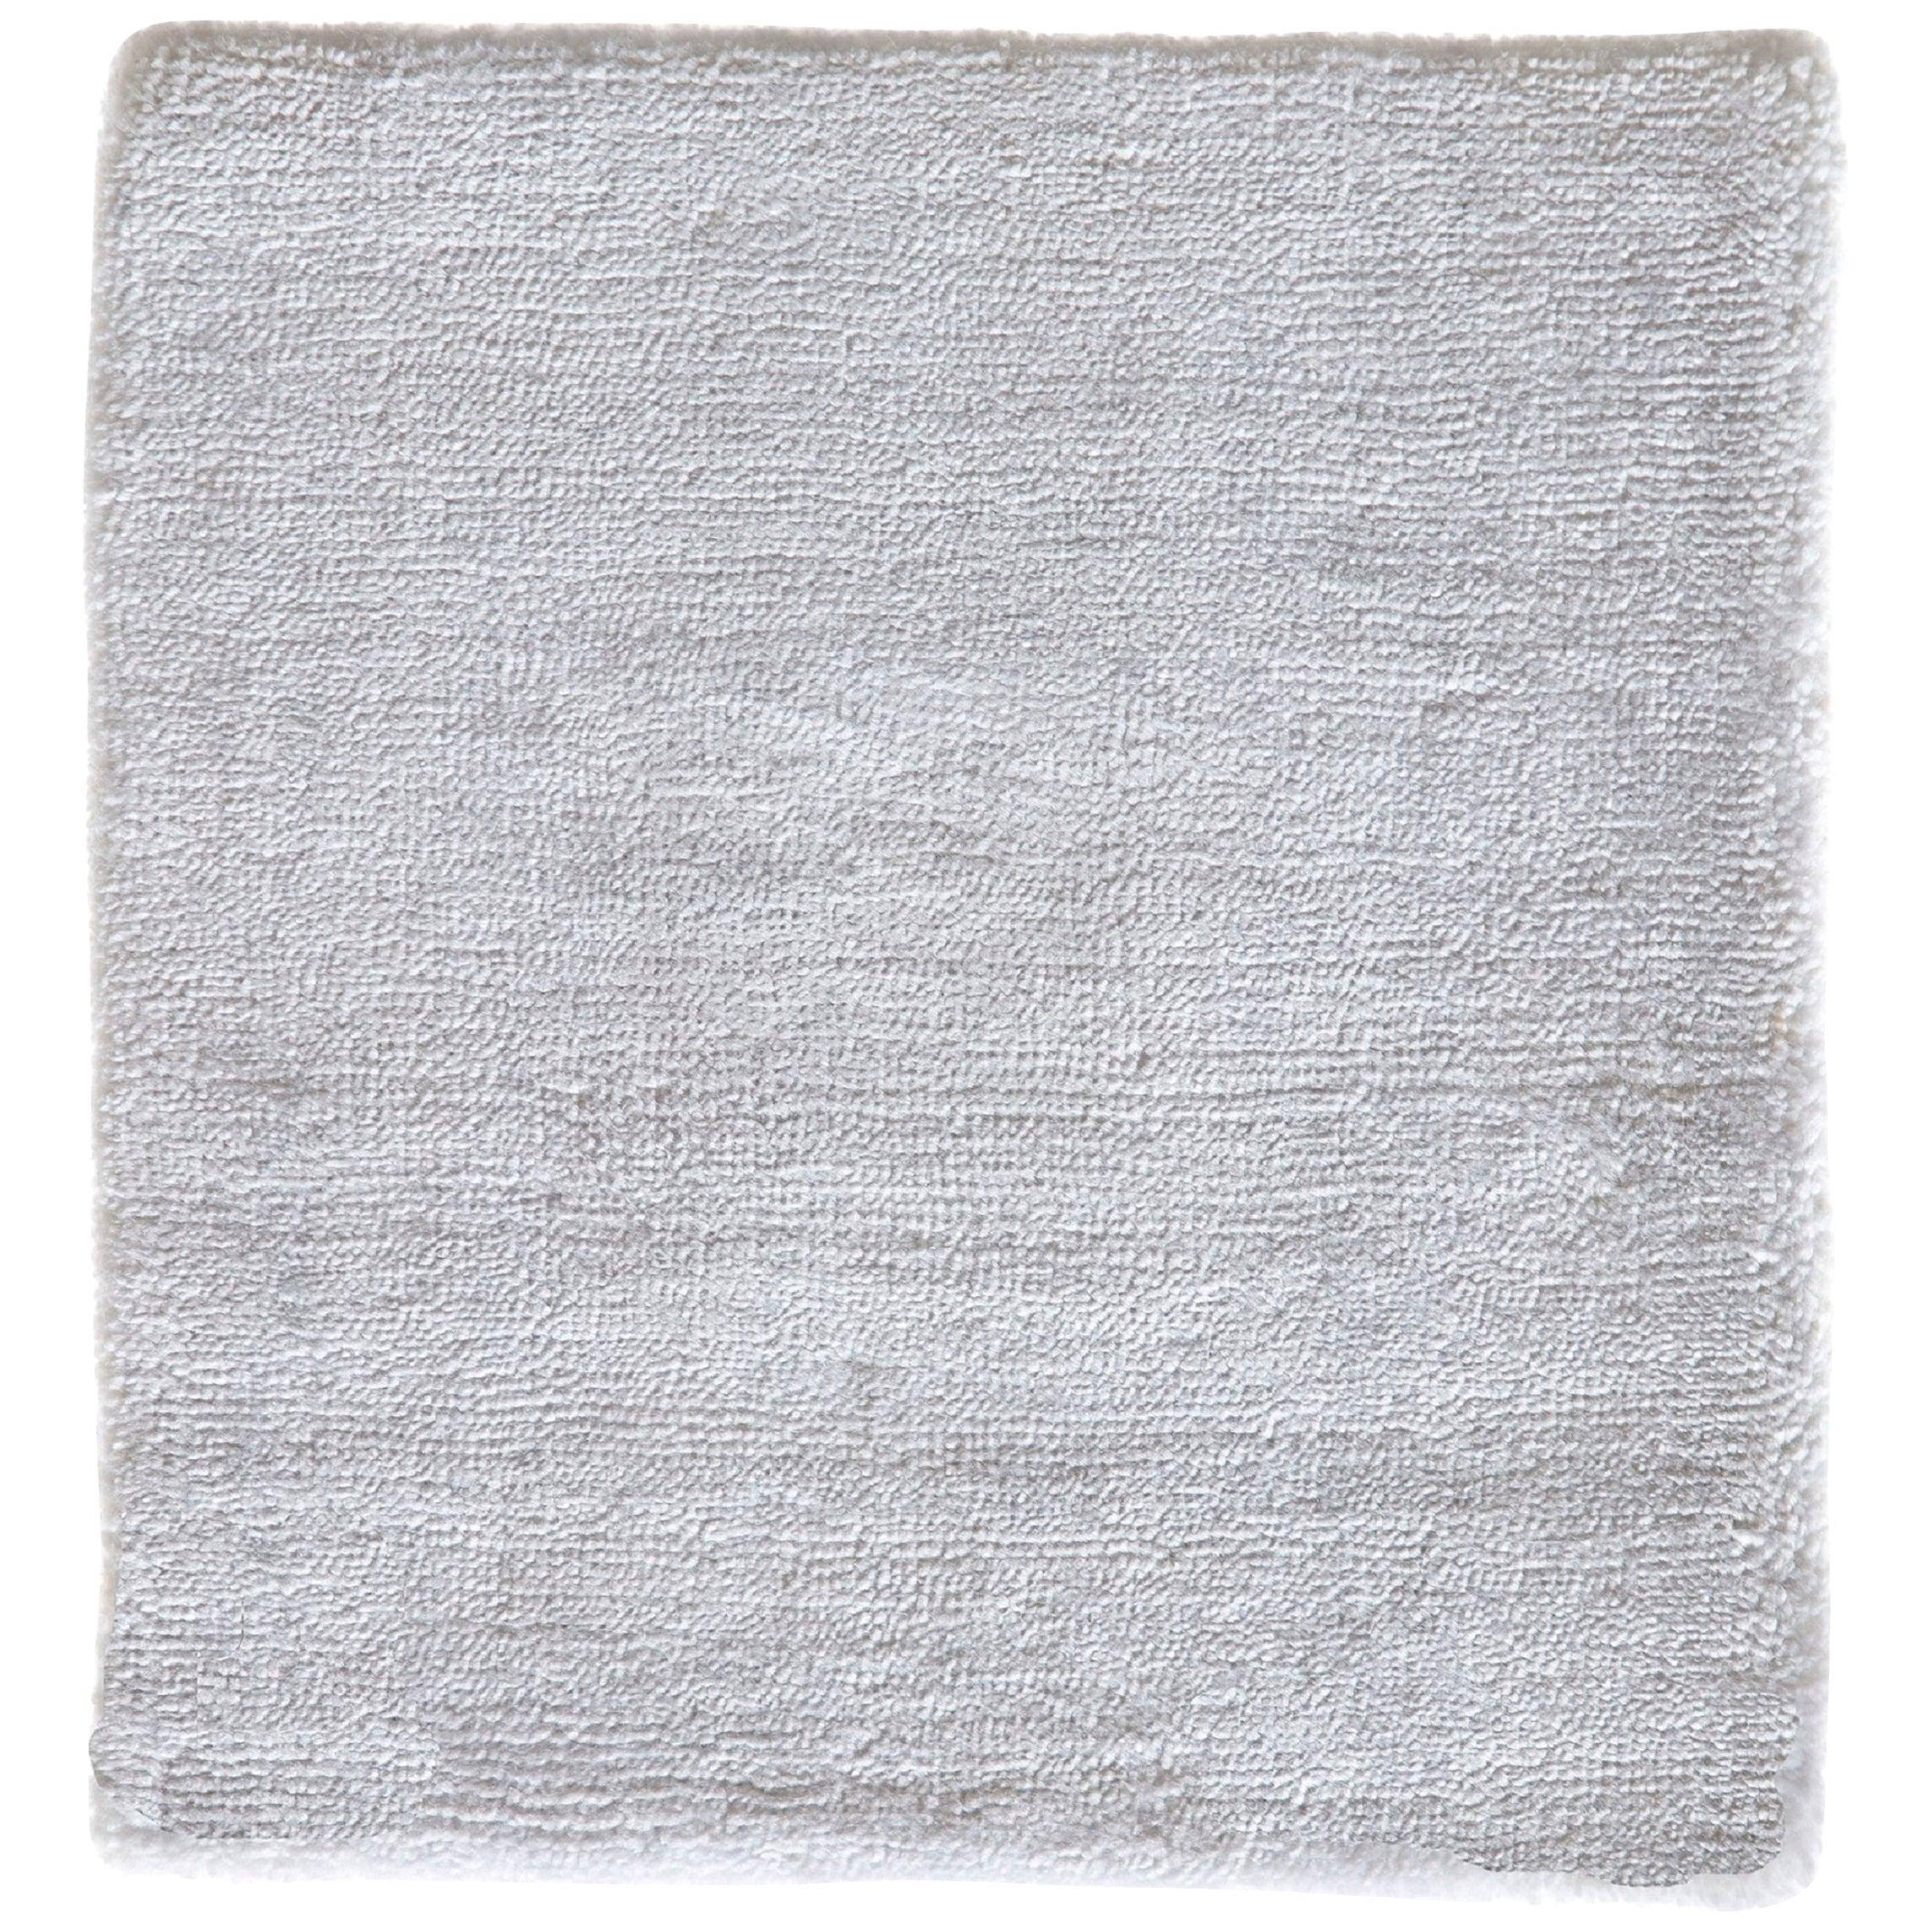 Natural White Hand-loomed Bamboo Silk Modernist Rug